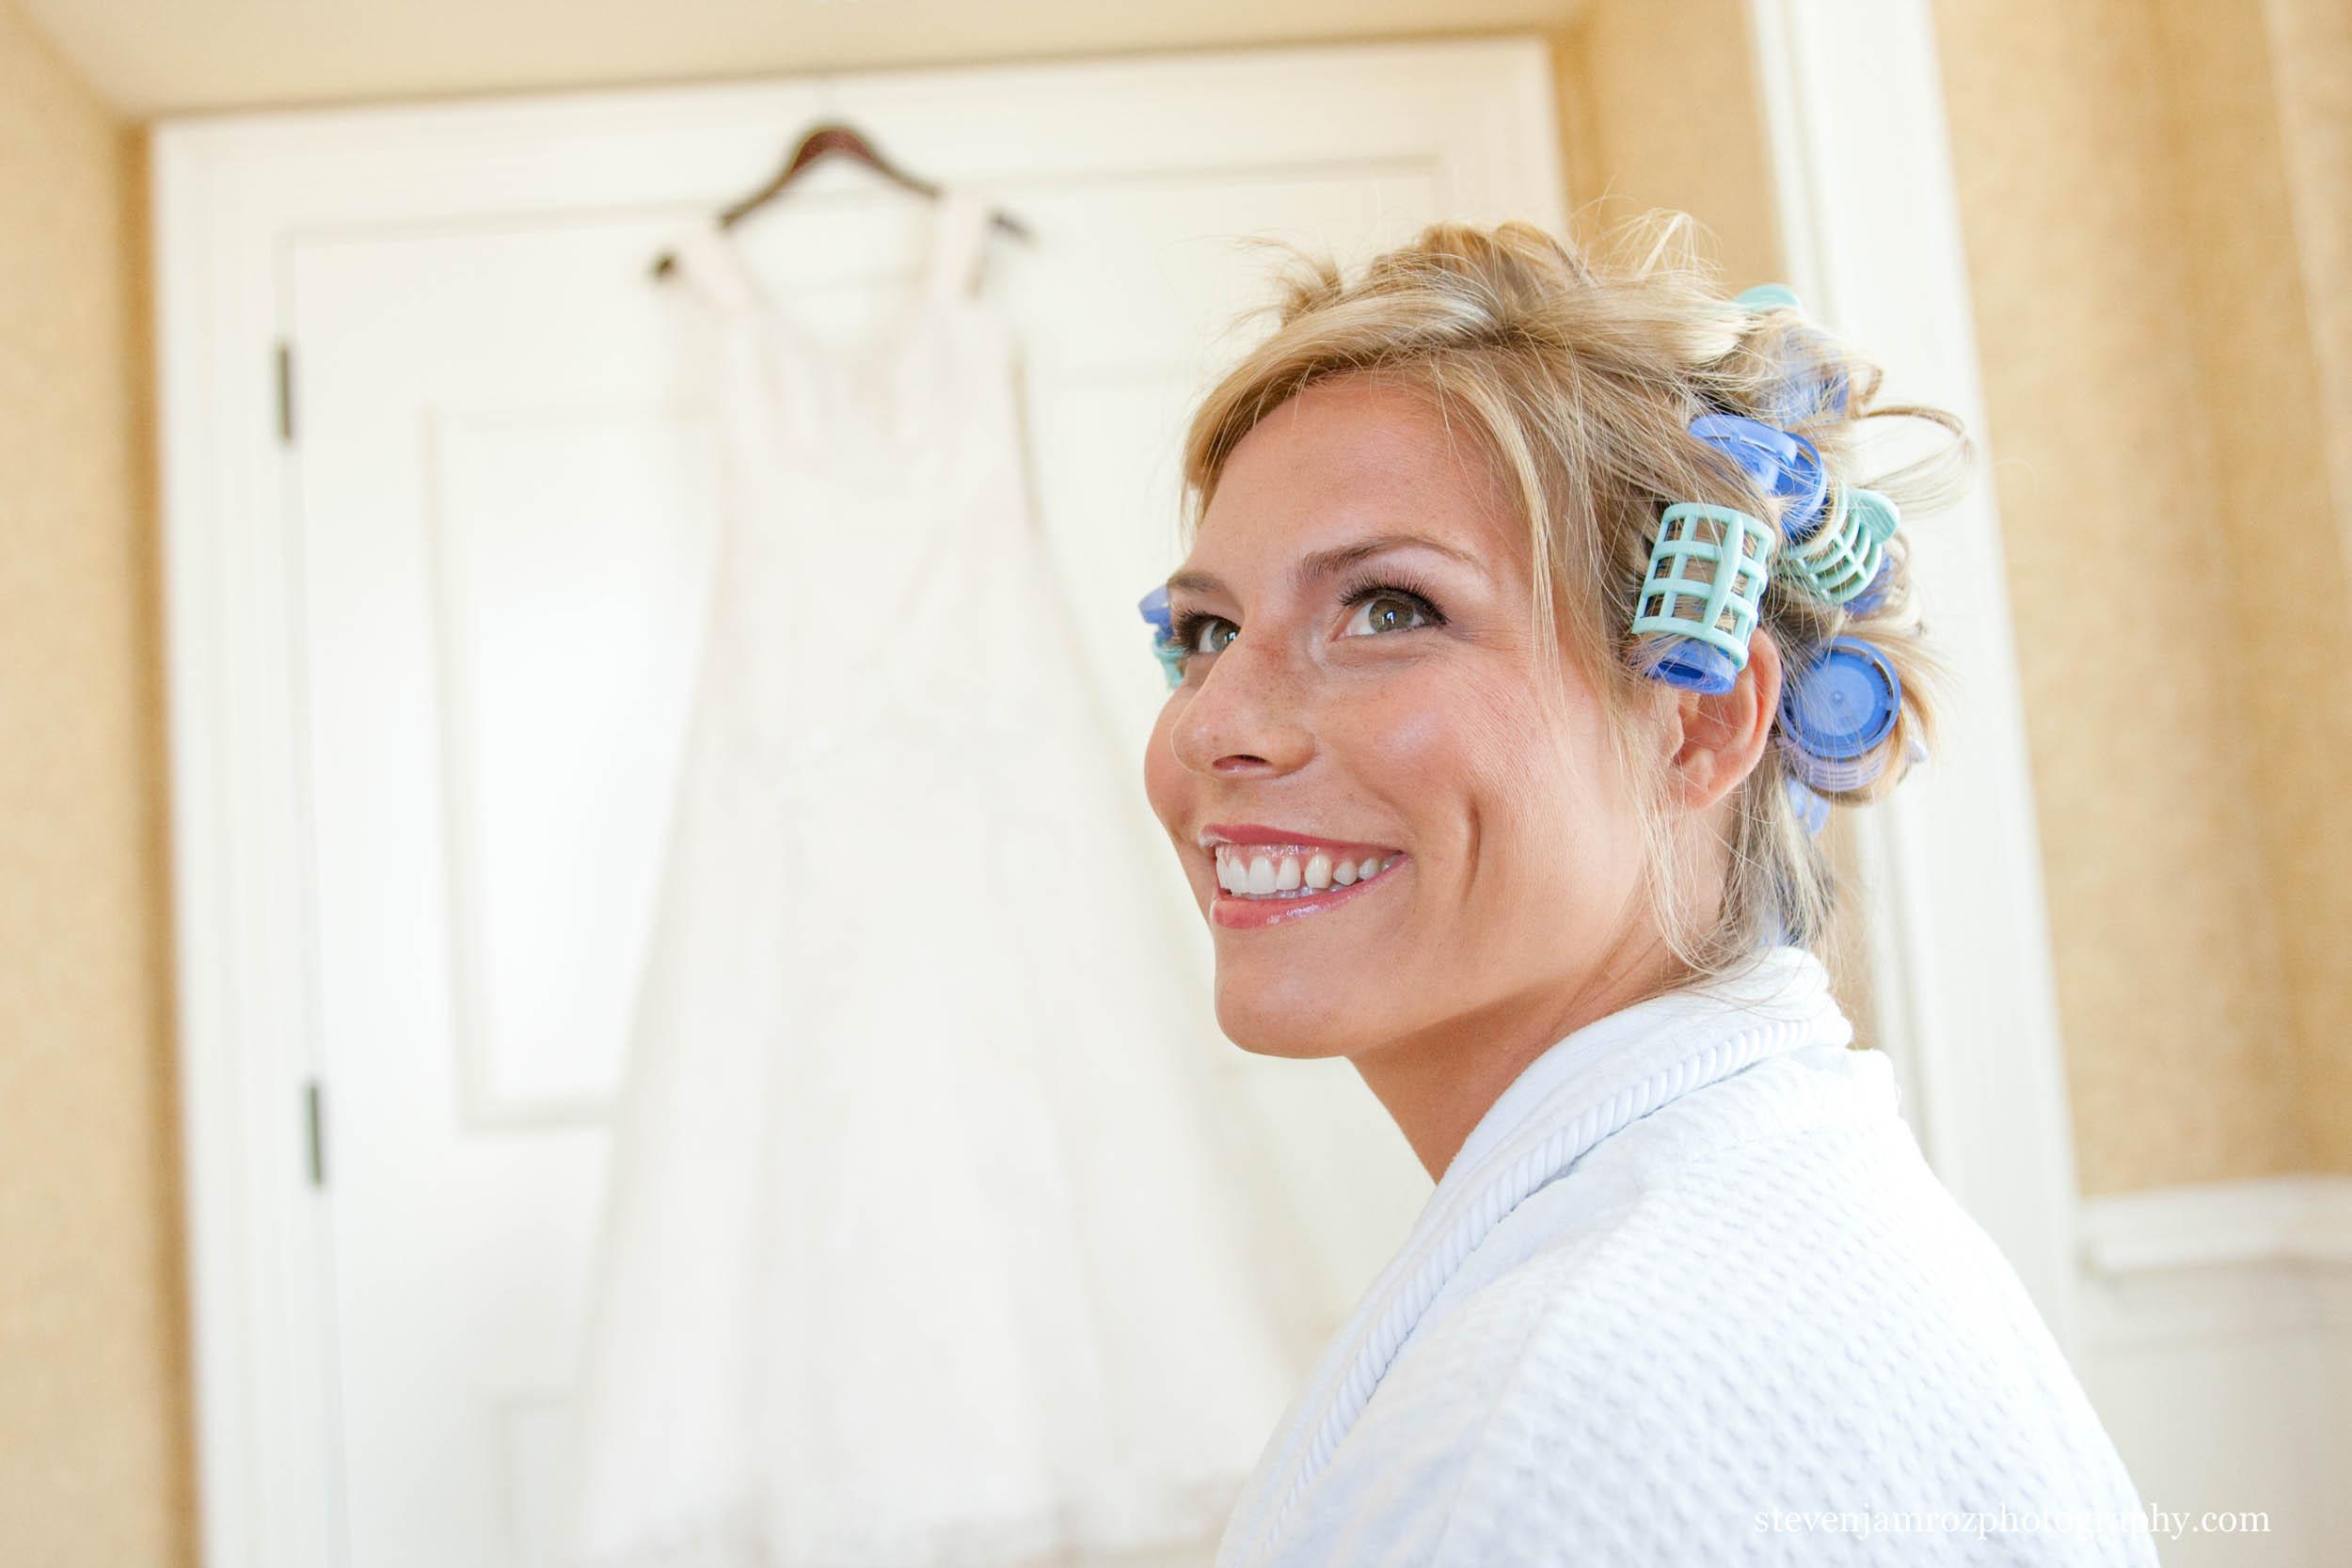 bride-curlers-in-hair-wedding-steven-jamroz-photography-0031.jpg